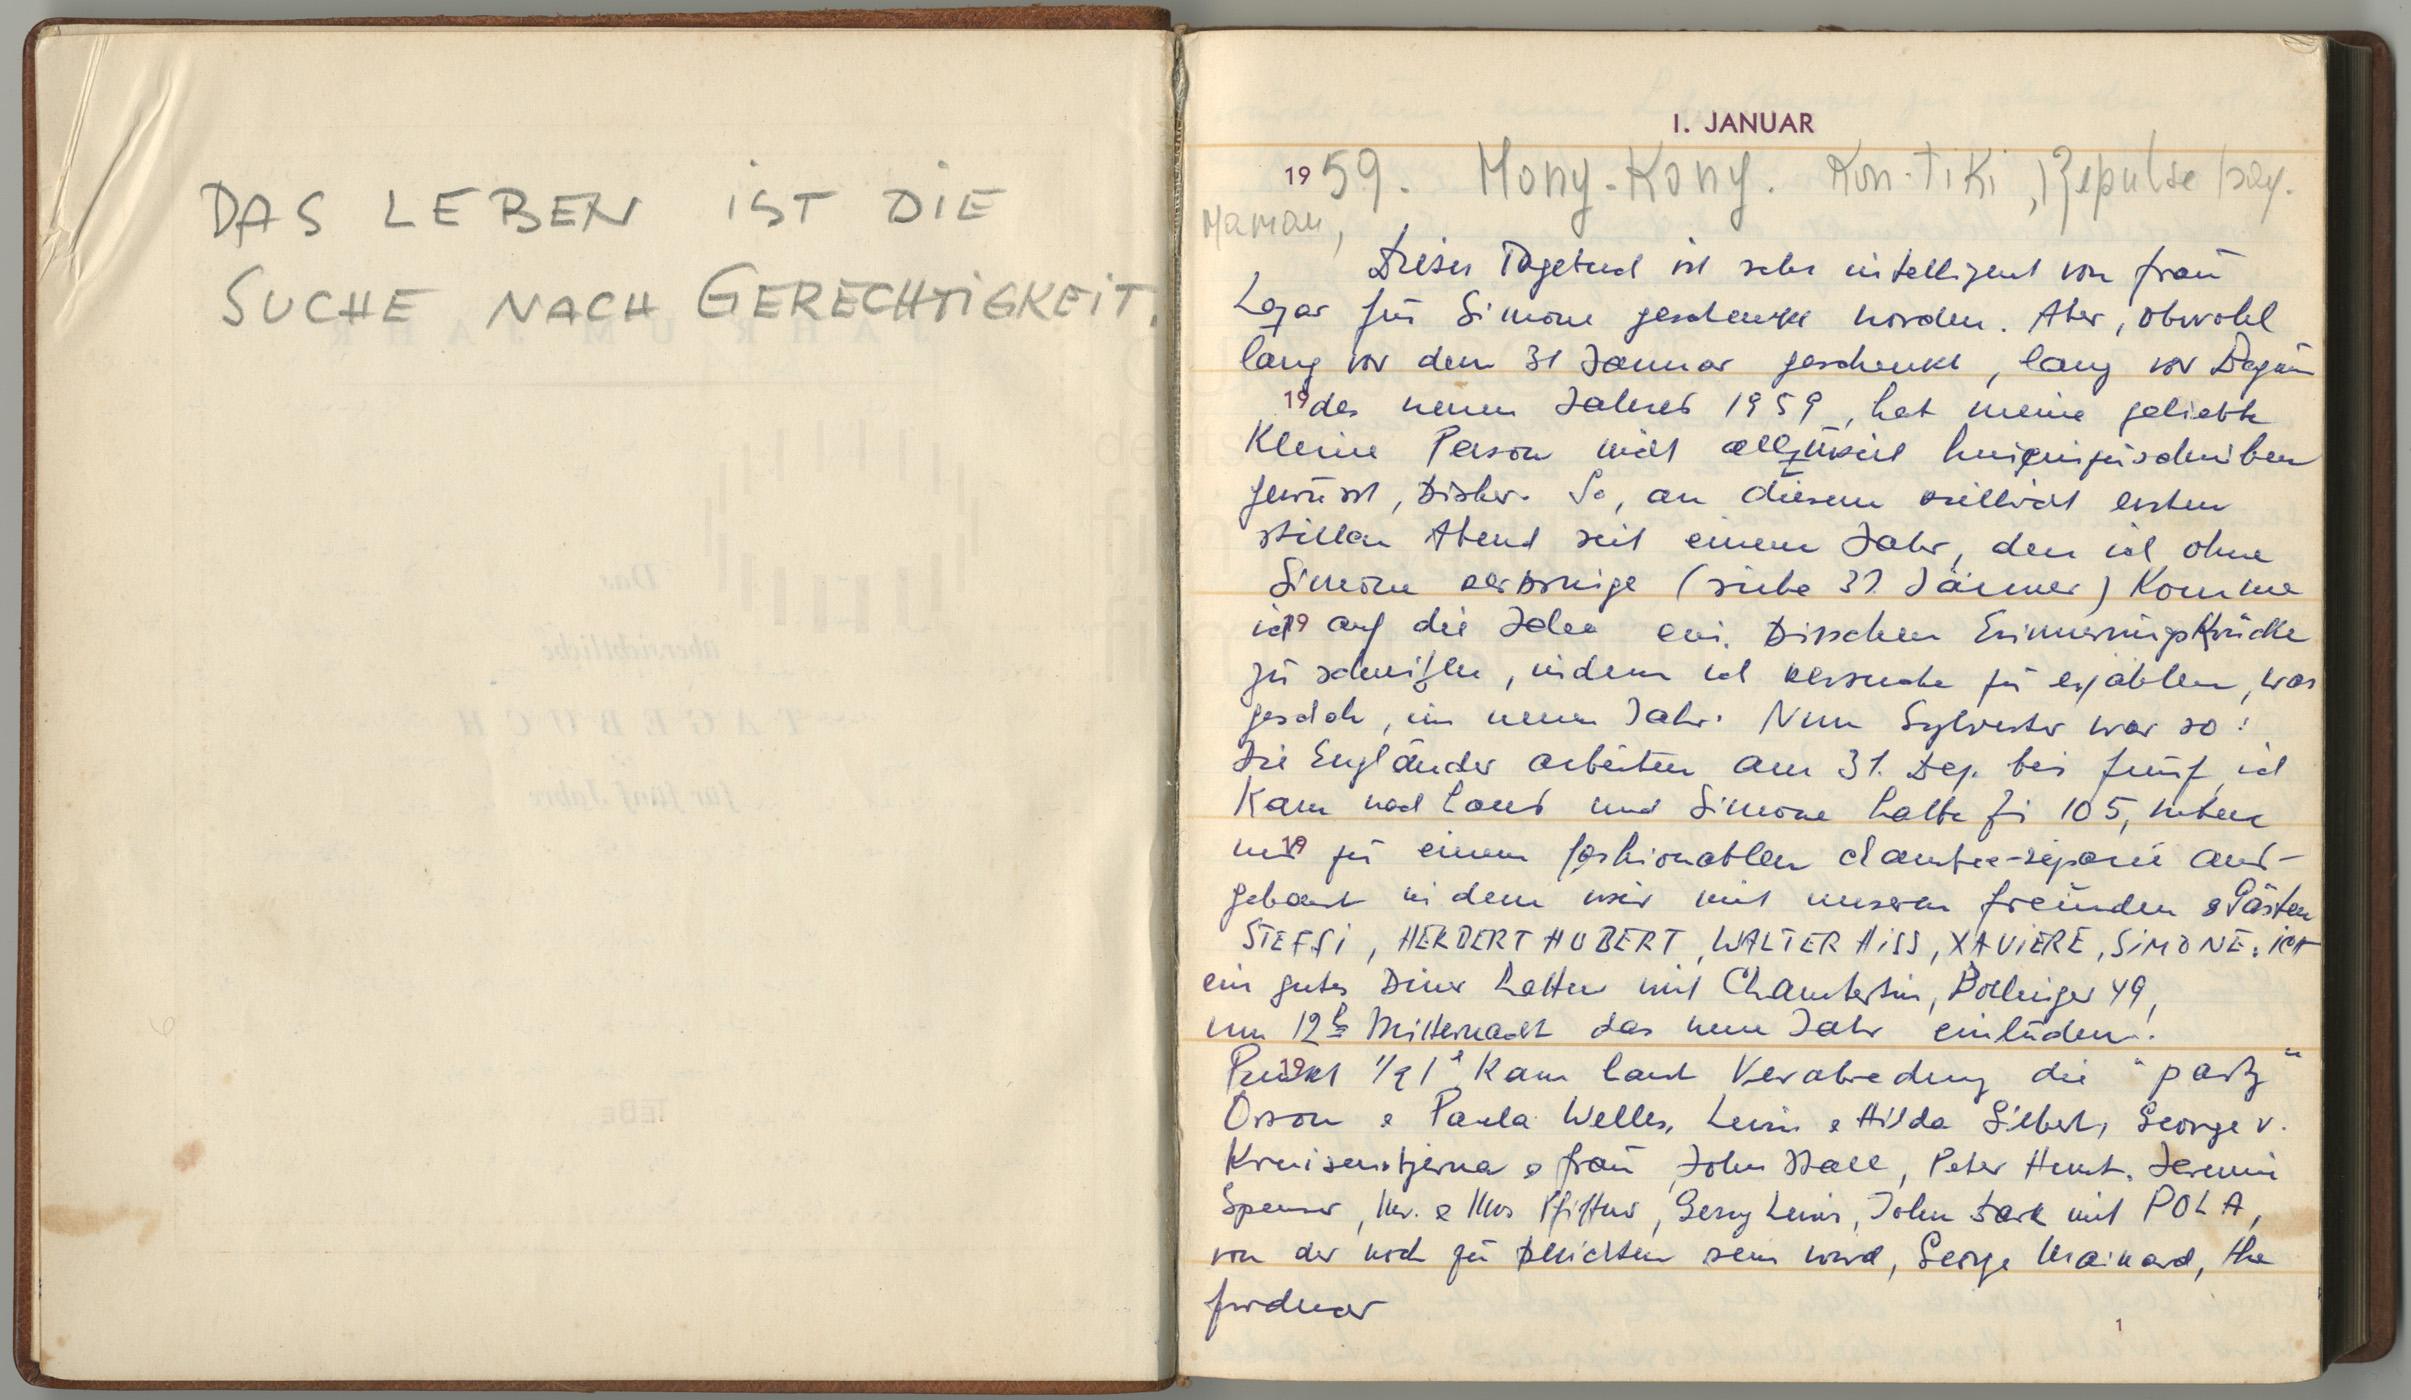 Tagebucheintrag vom 1.1.1959